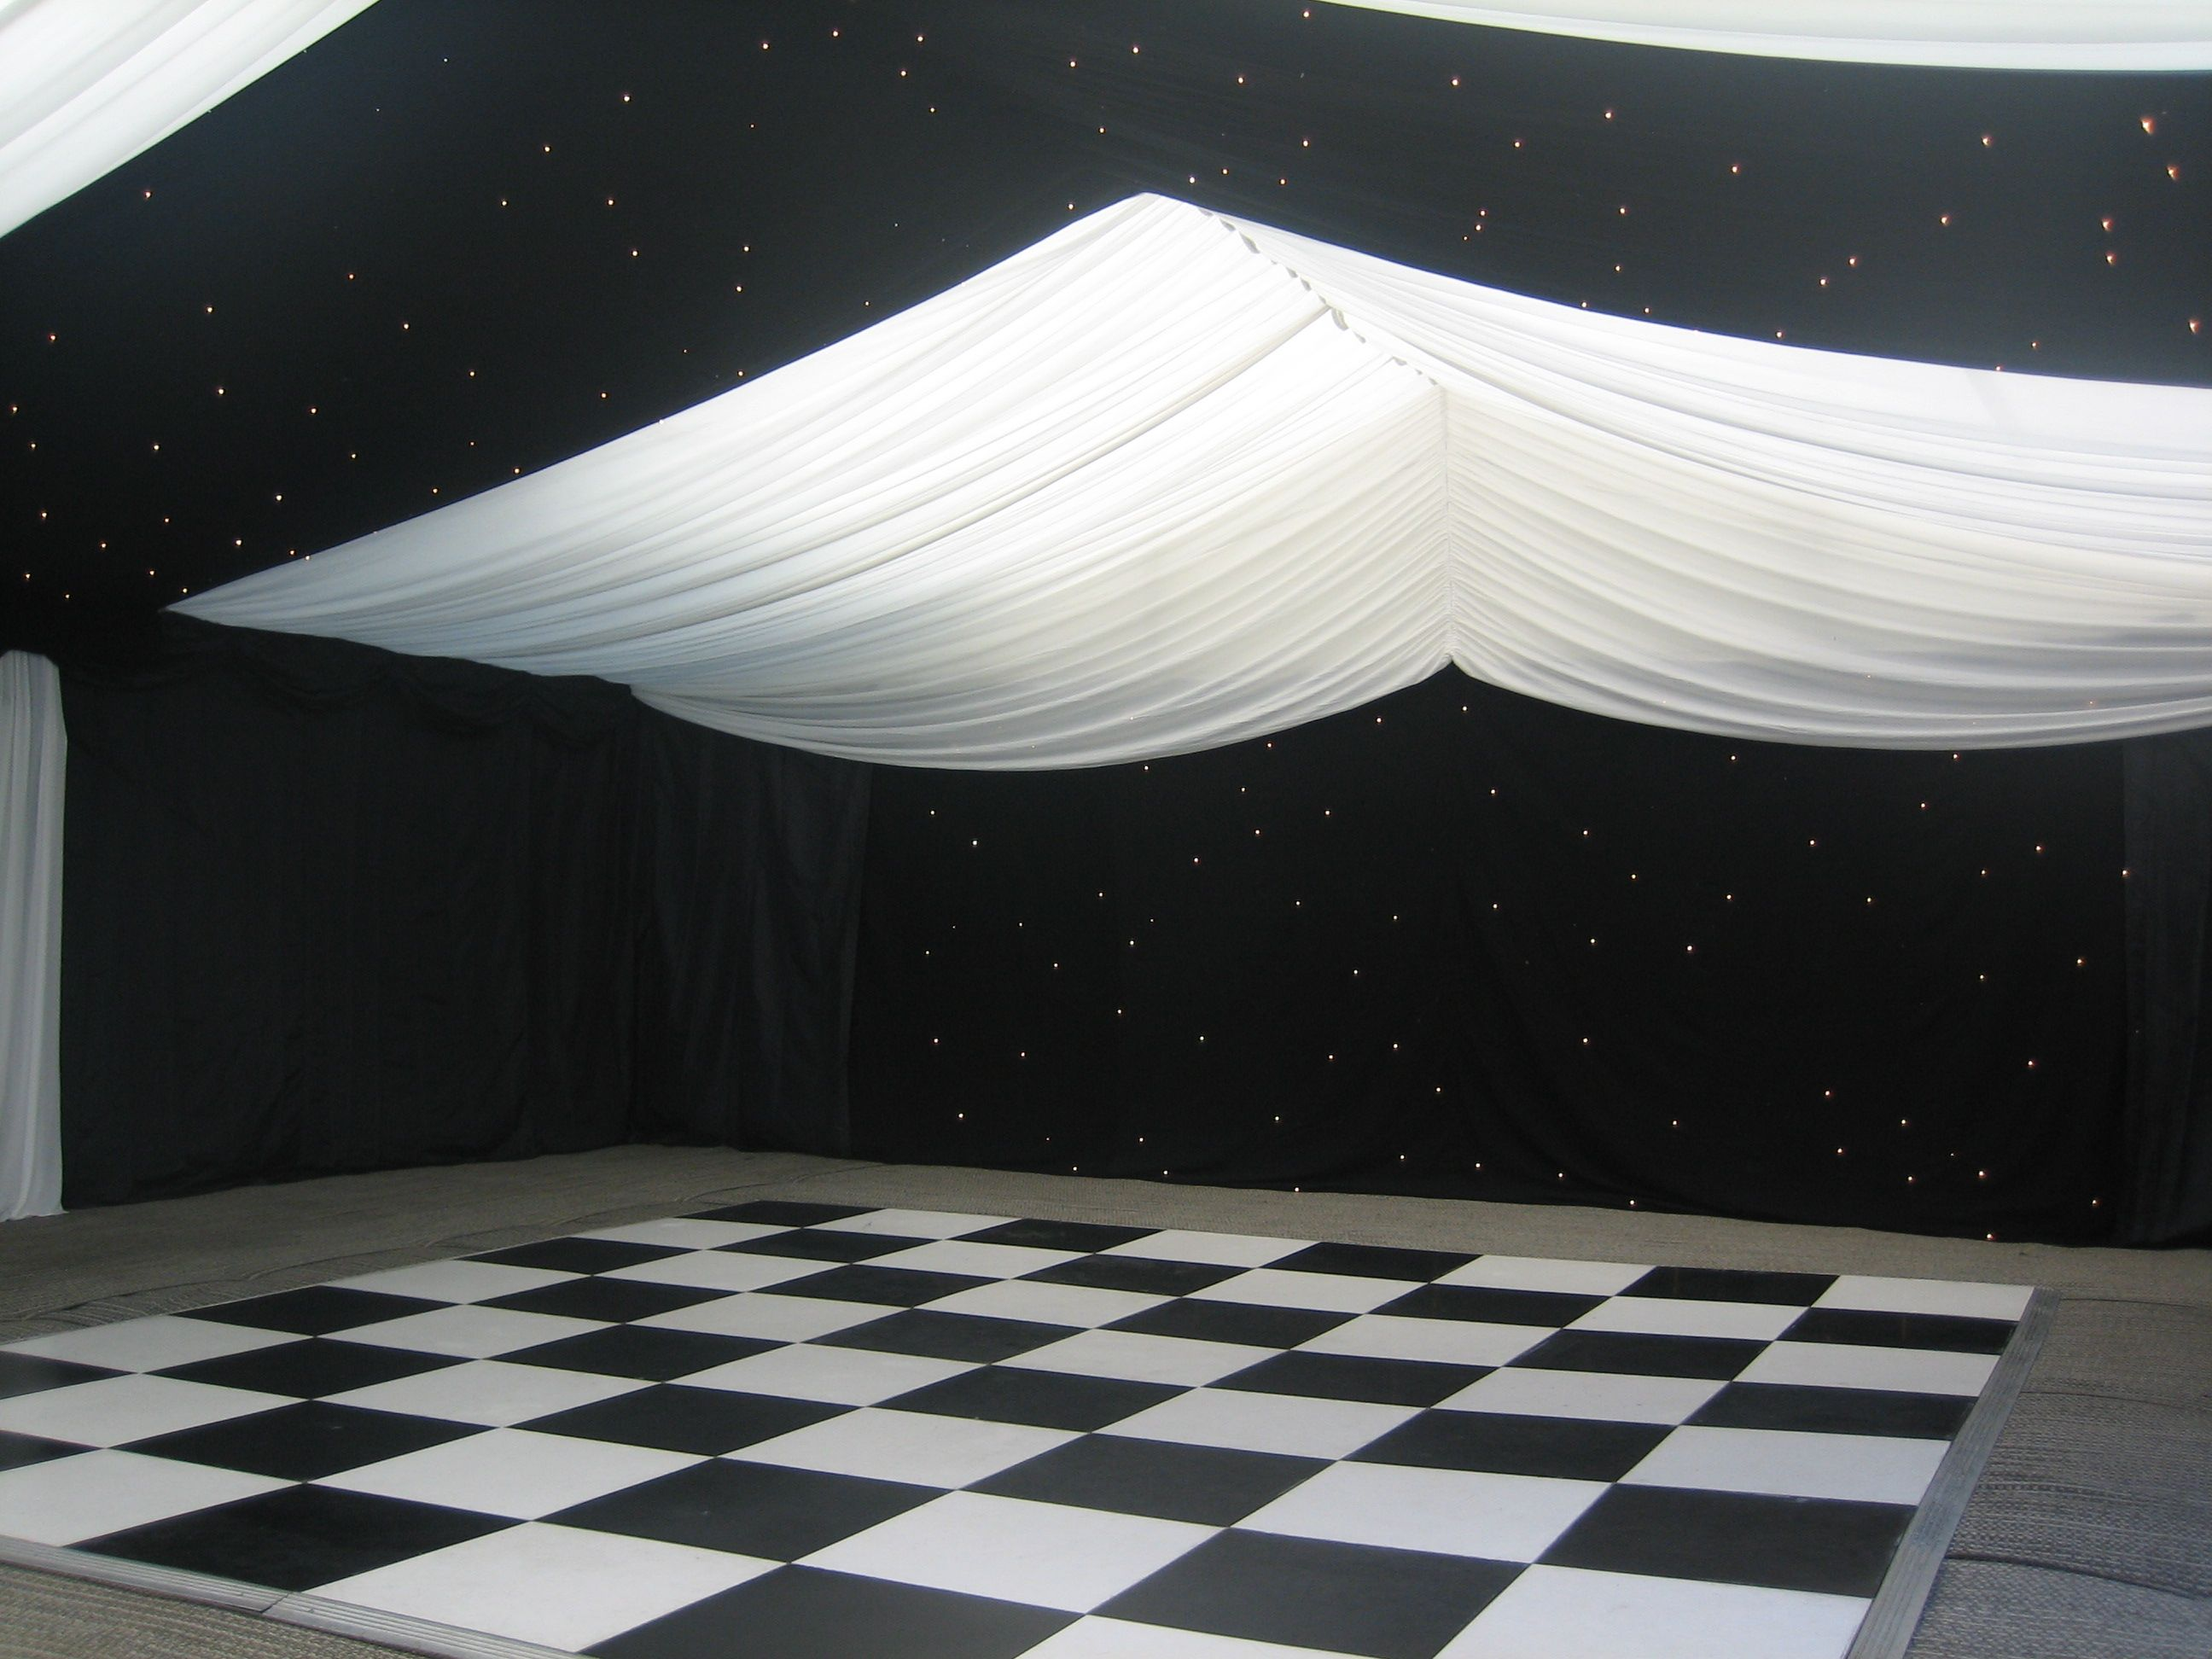 Marquee Dance Floor Marquee Hire Valance Curtains Dance Floor